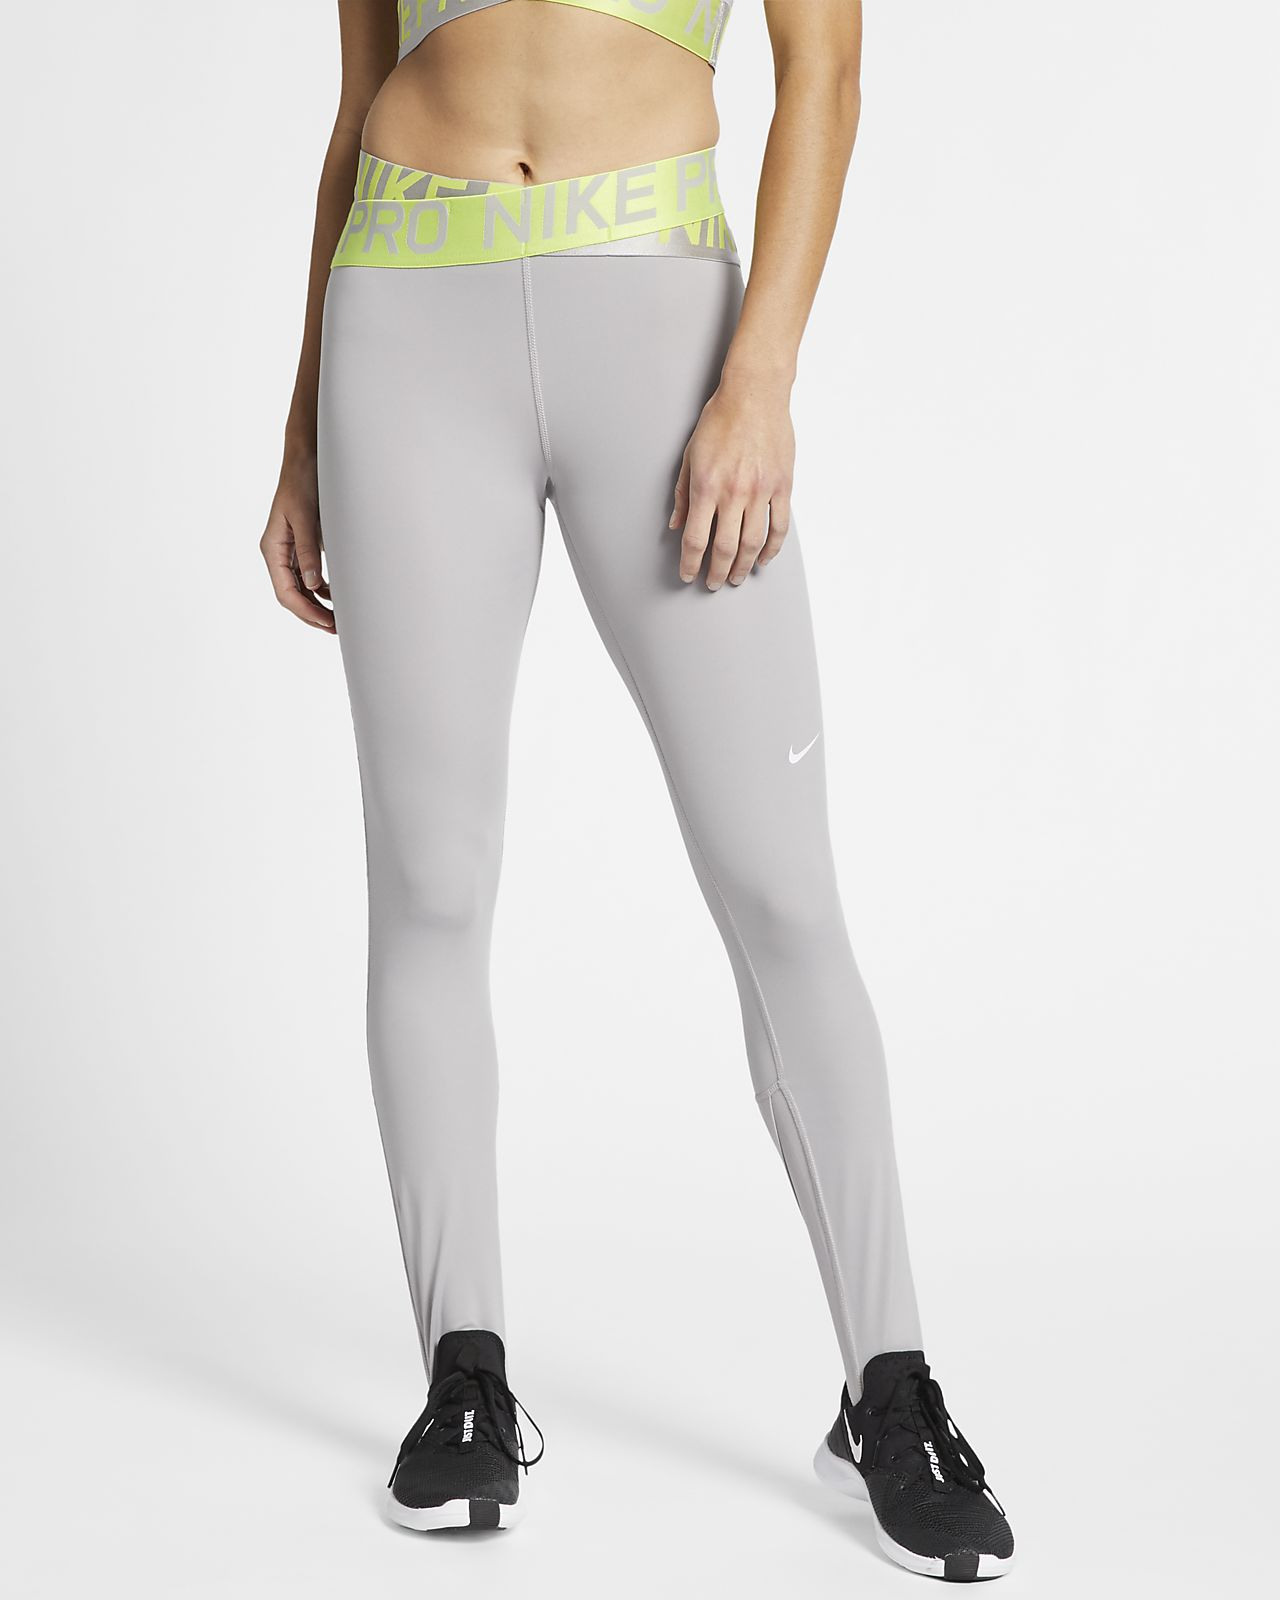 Nike Pro Intertwist Malles - Dona